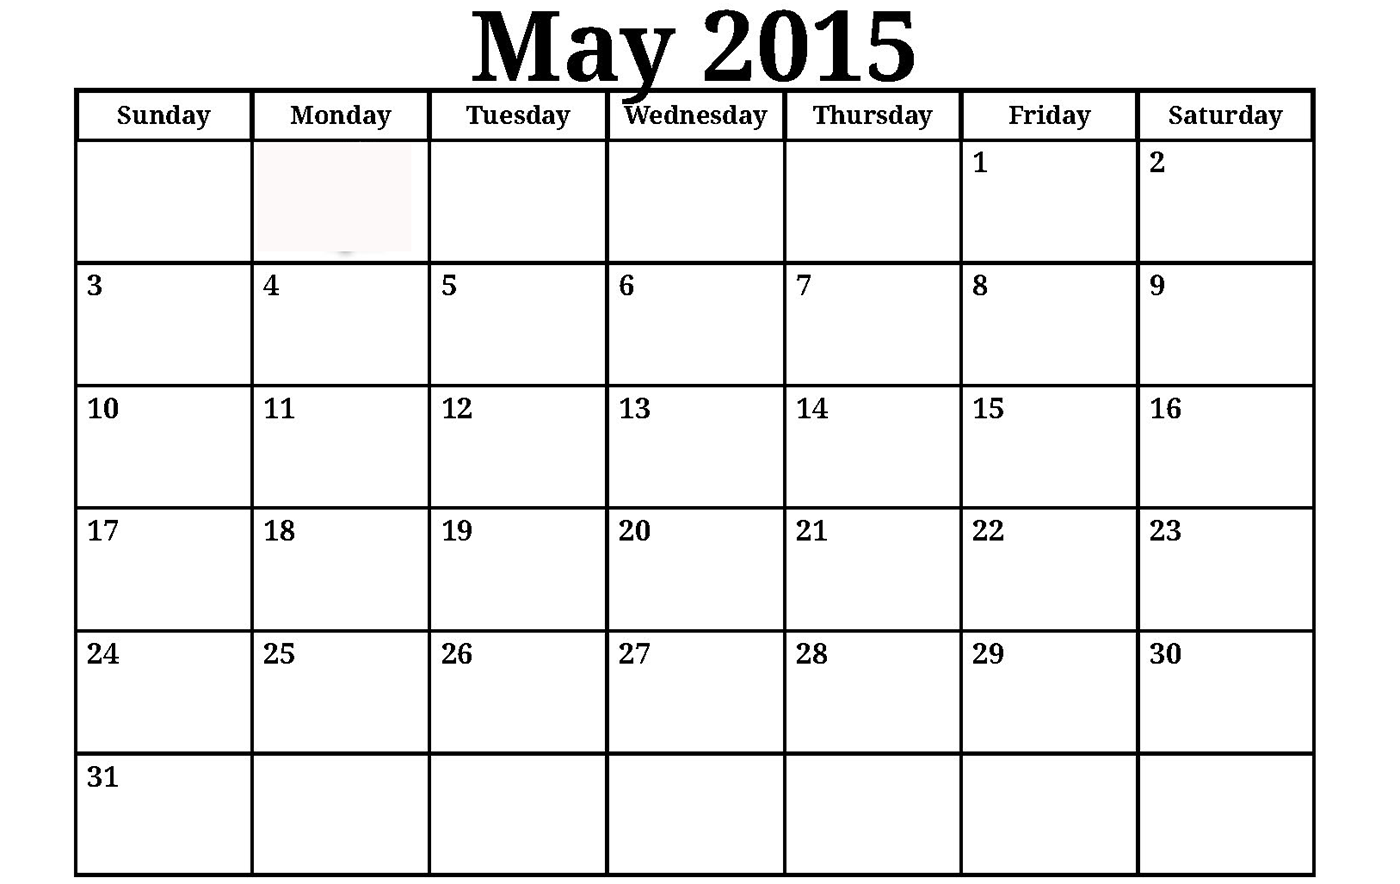 2015 may calendar template 3